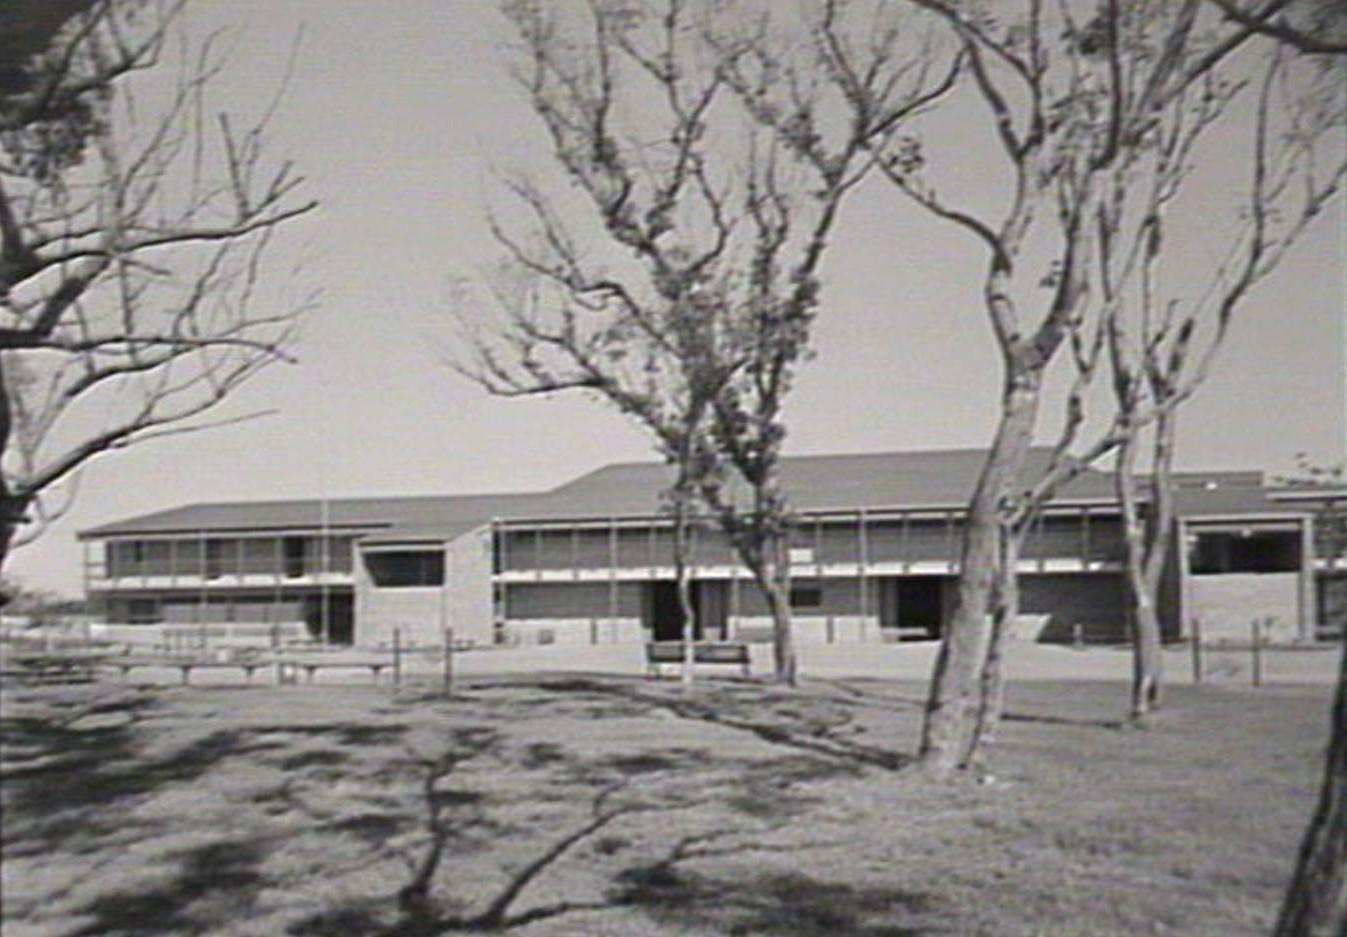 Gorokan Australia  city photos gallery : Gorokan High School: REUNION 1970s students first four years ...